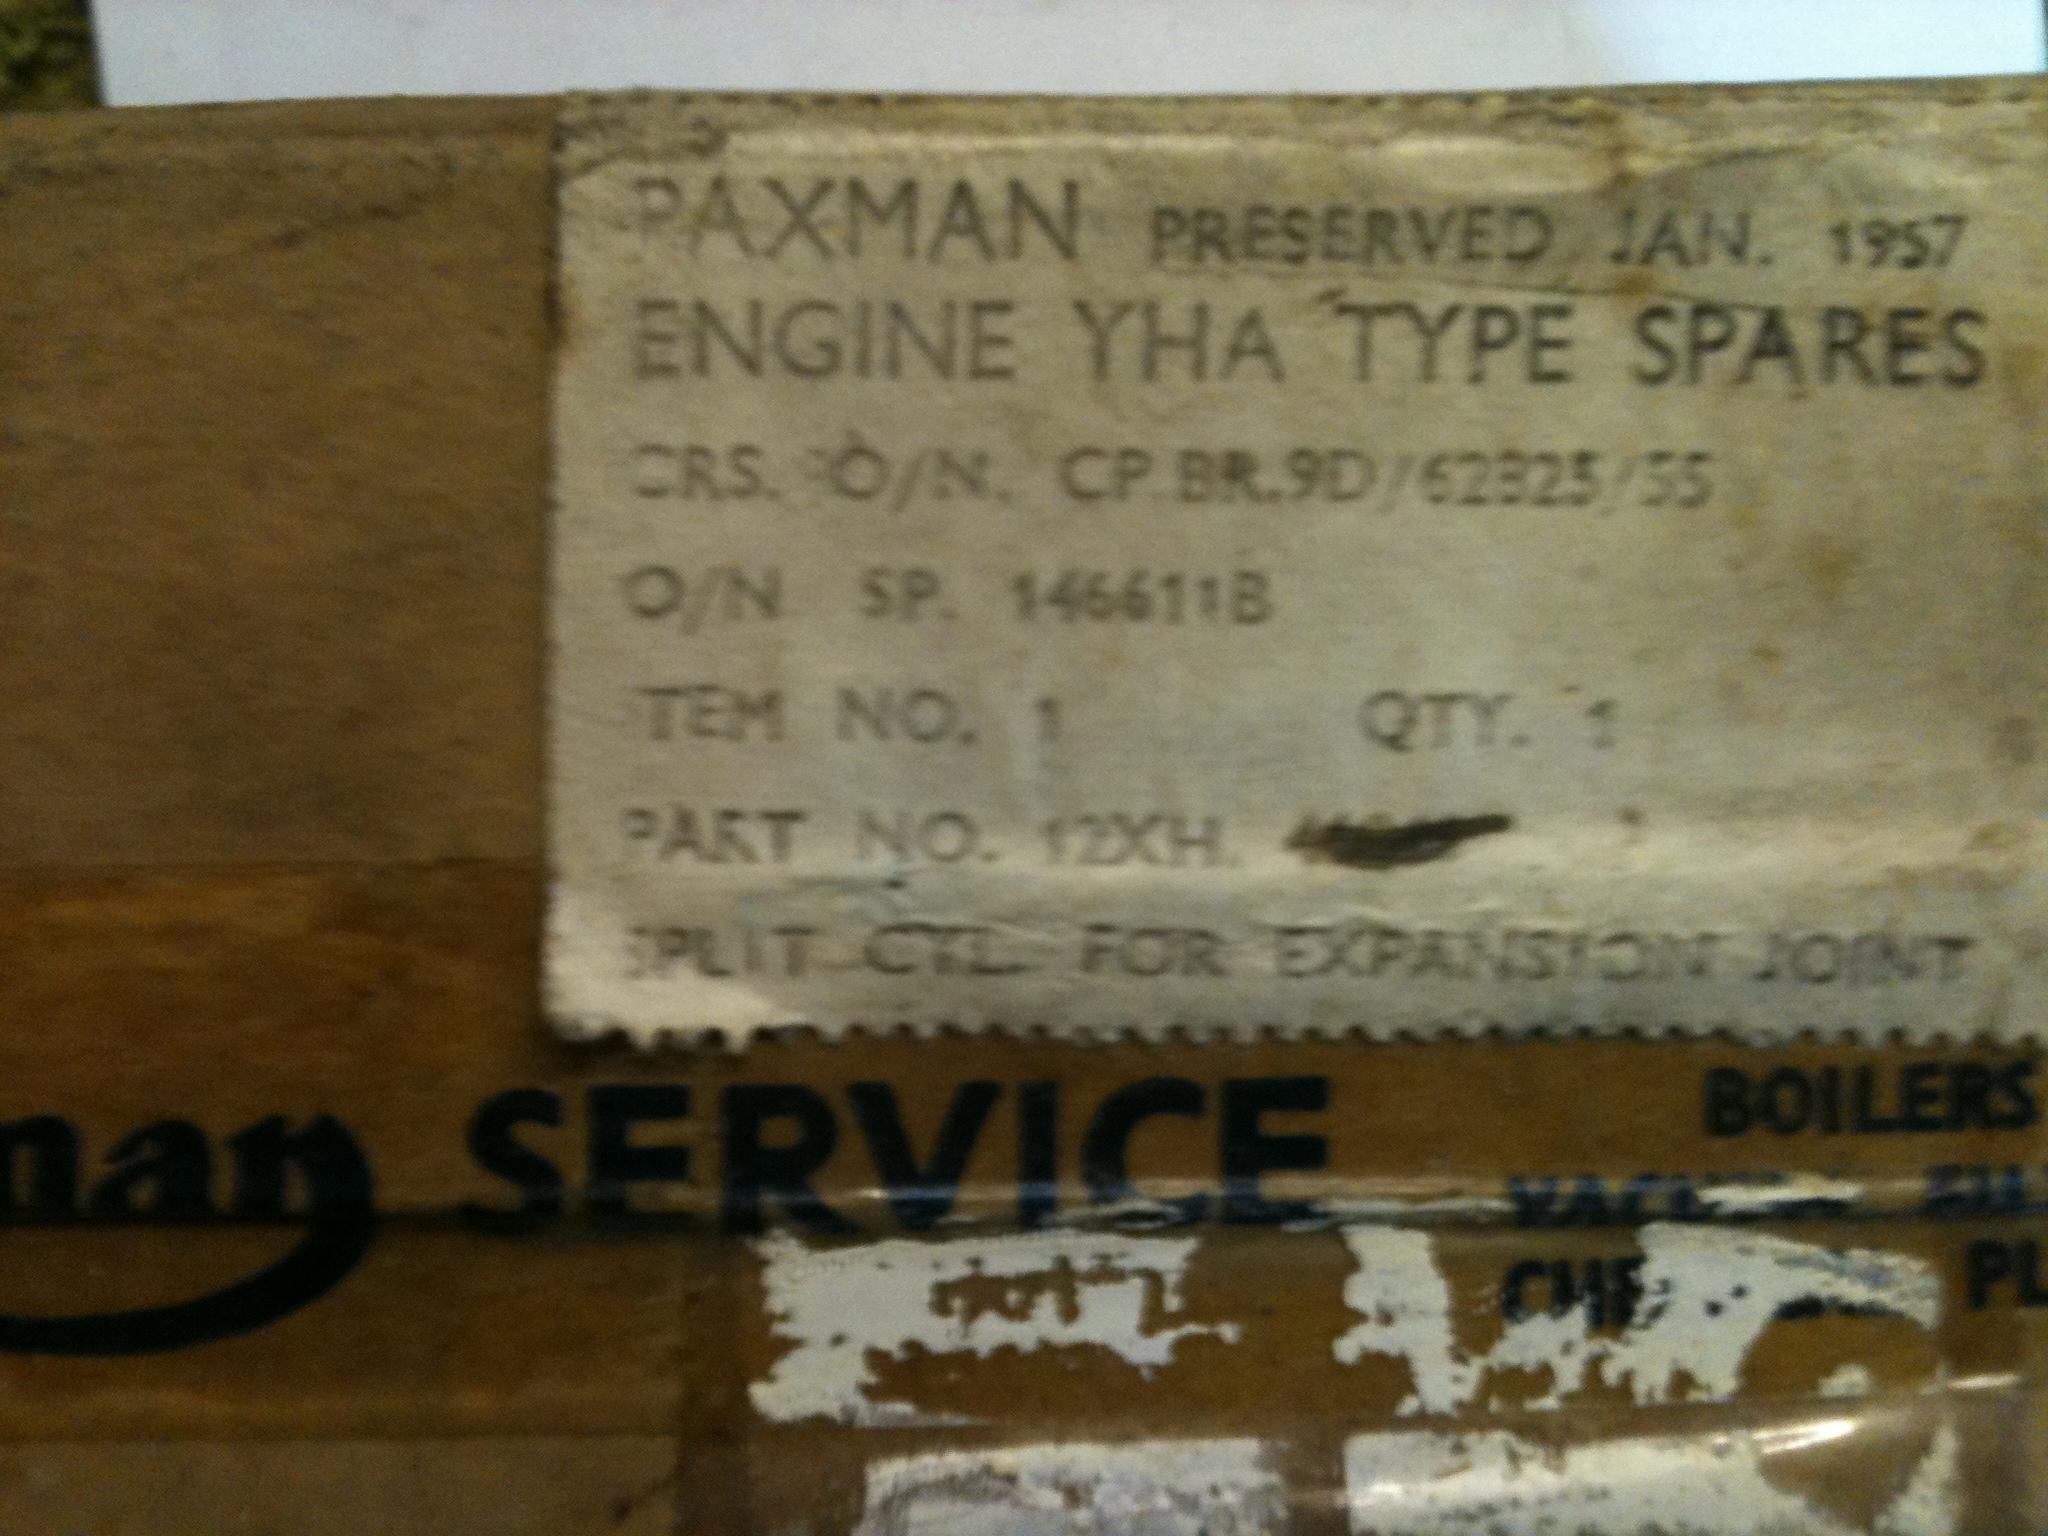 1957 Paxman YHA parts